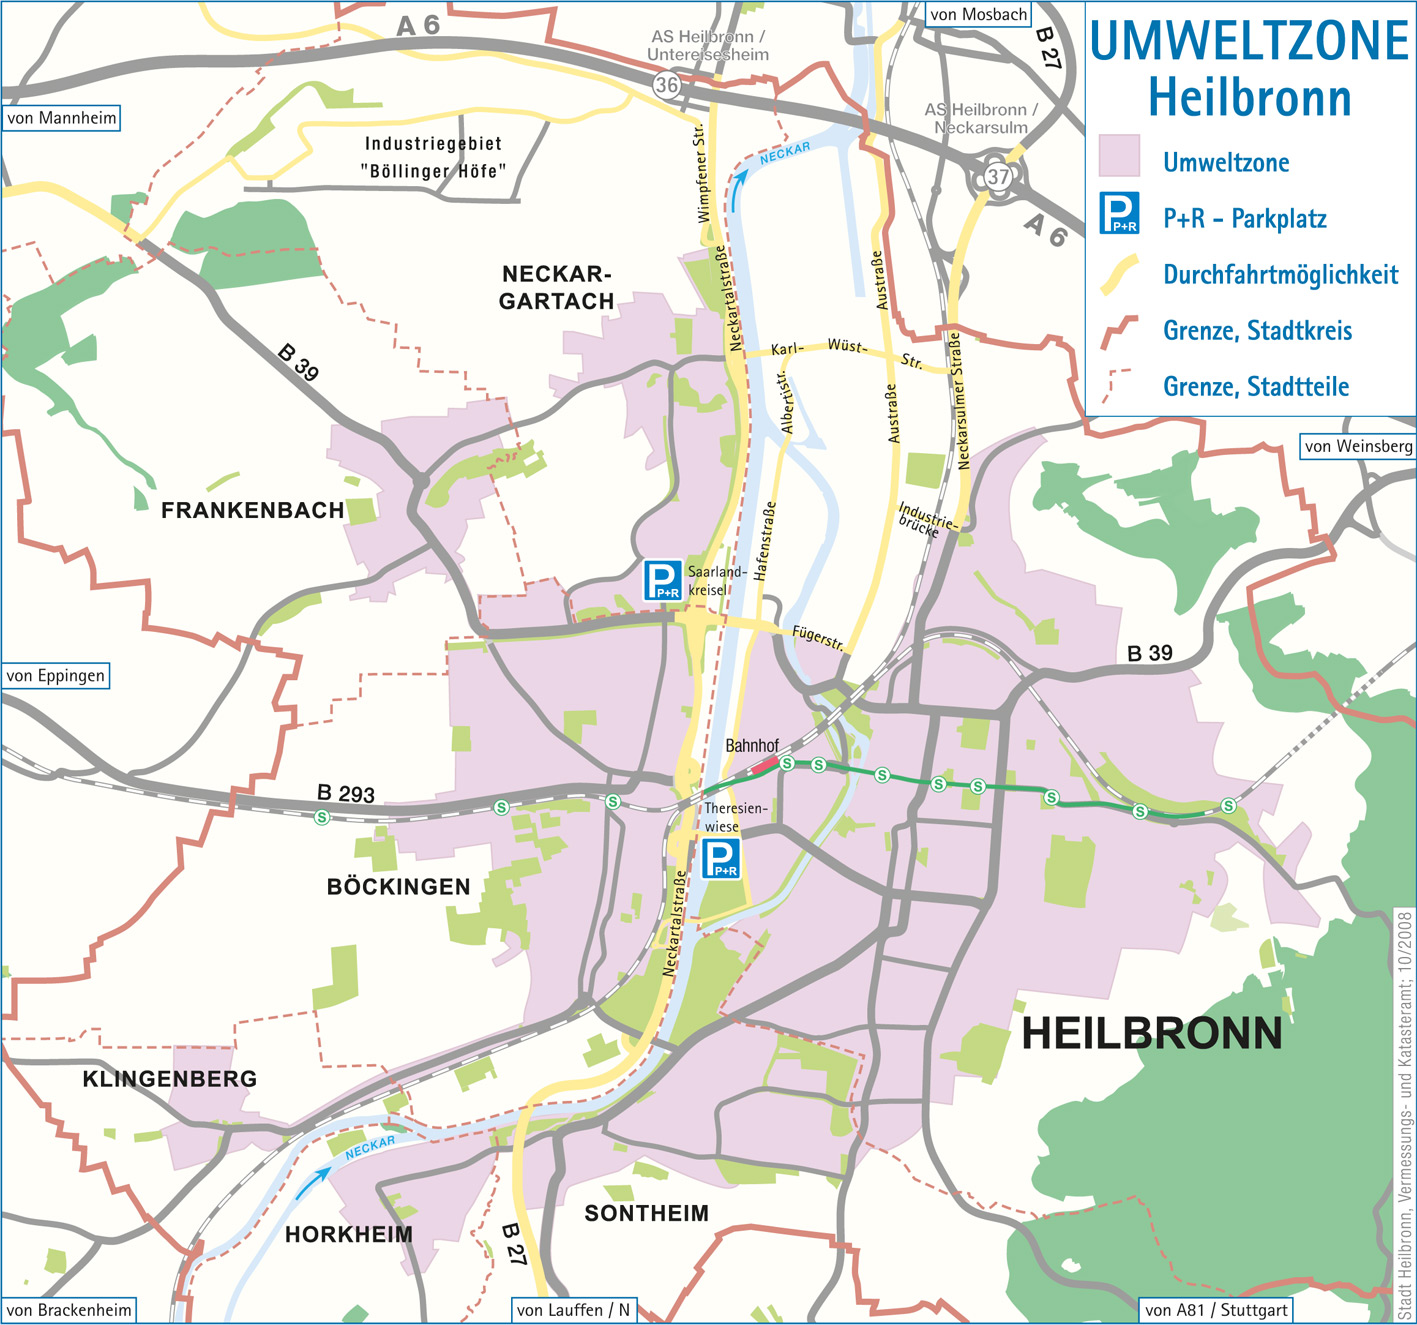 Region Heilbronn Franken Karte.Umweltzone